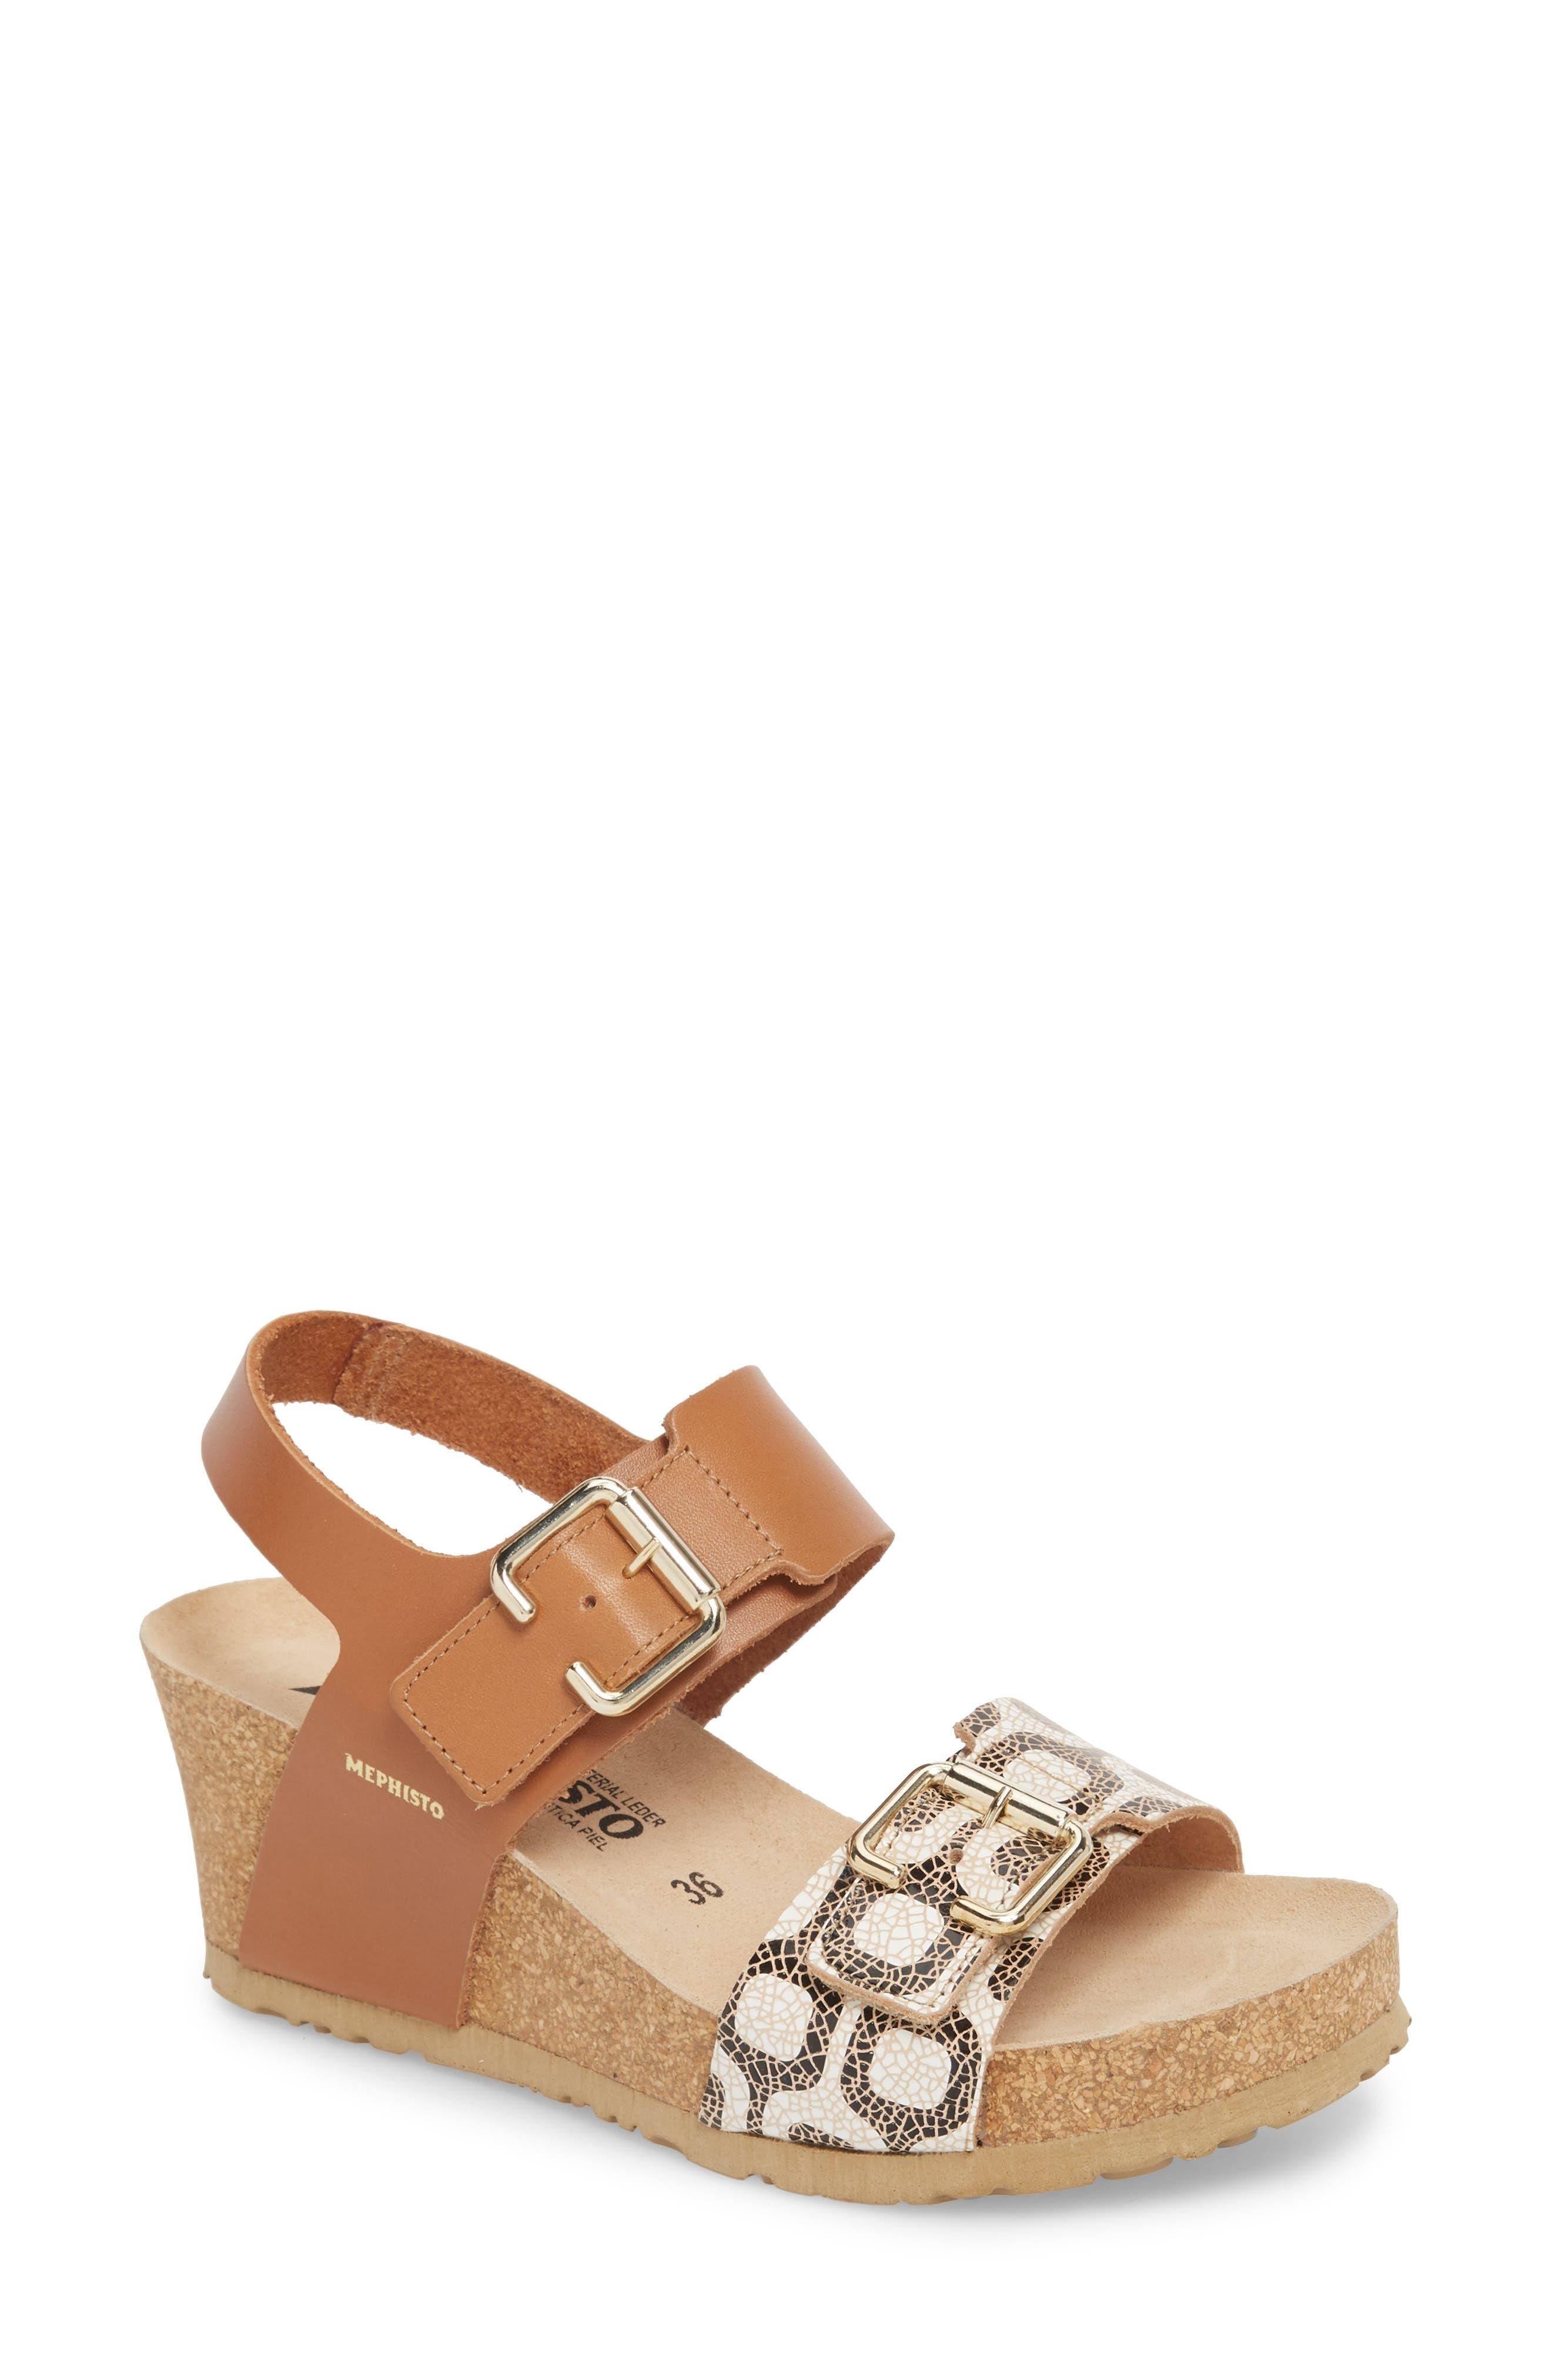 Lissandra Platform Wedge Sandal,                             Main thumbnail 1, color,                             Camel